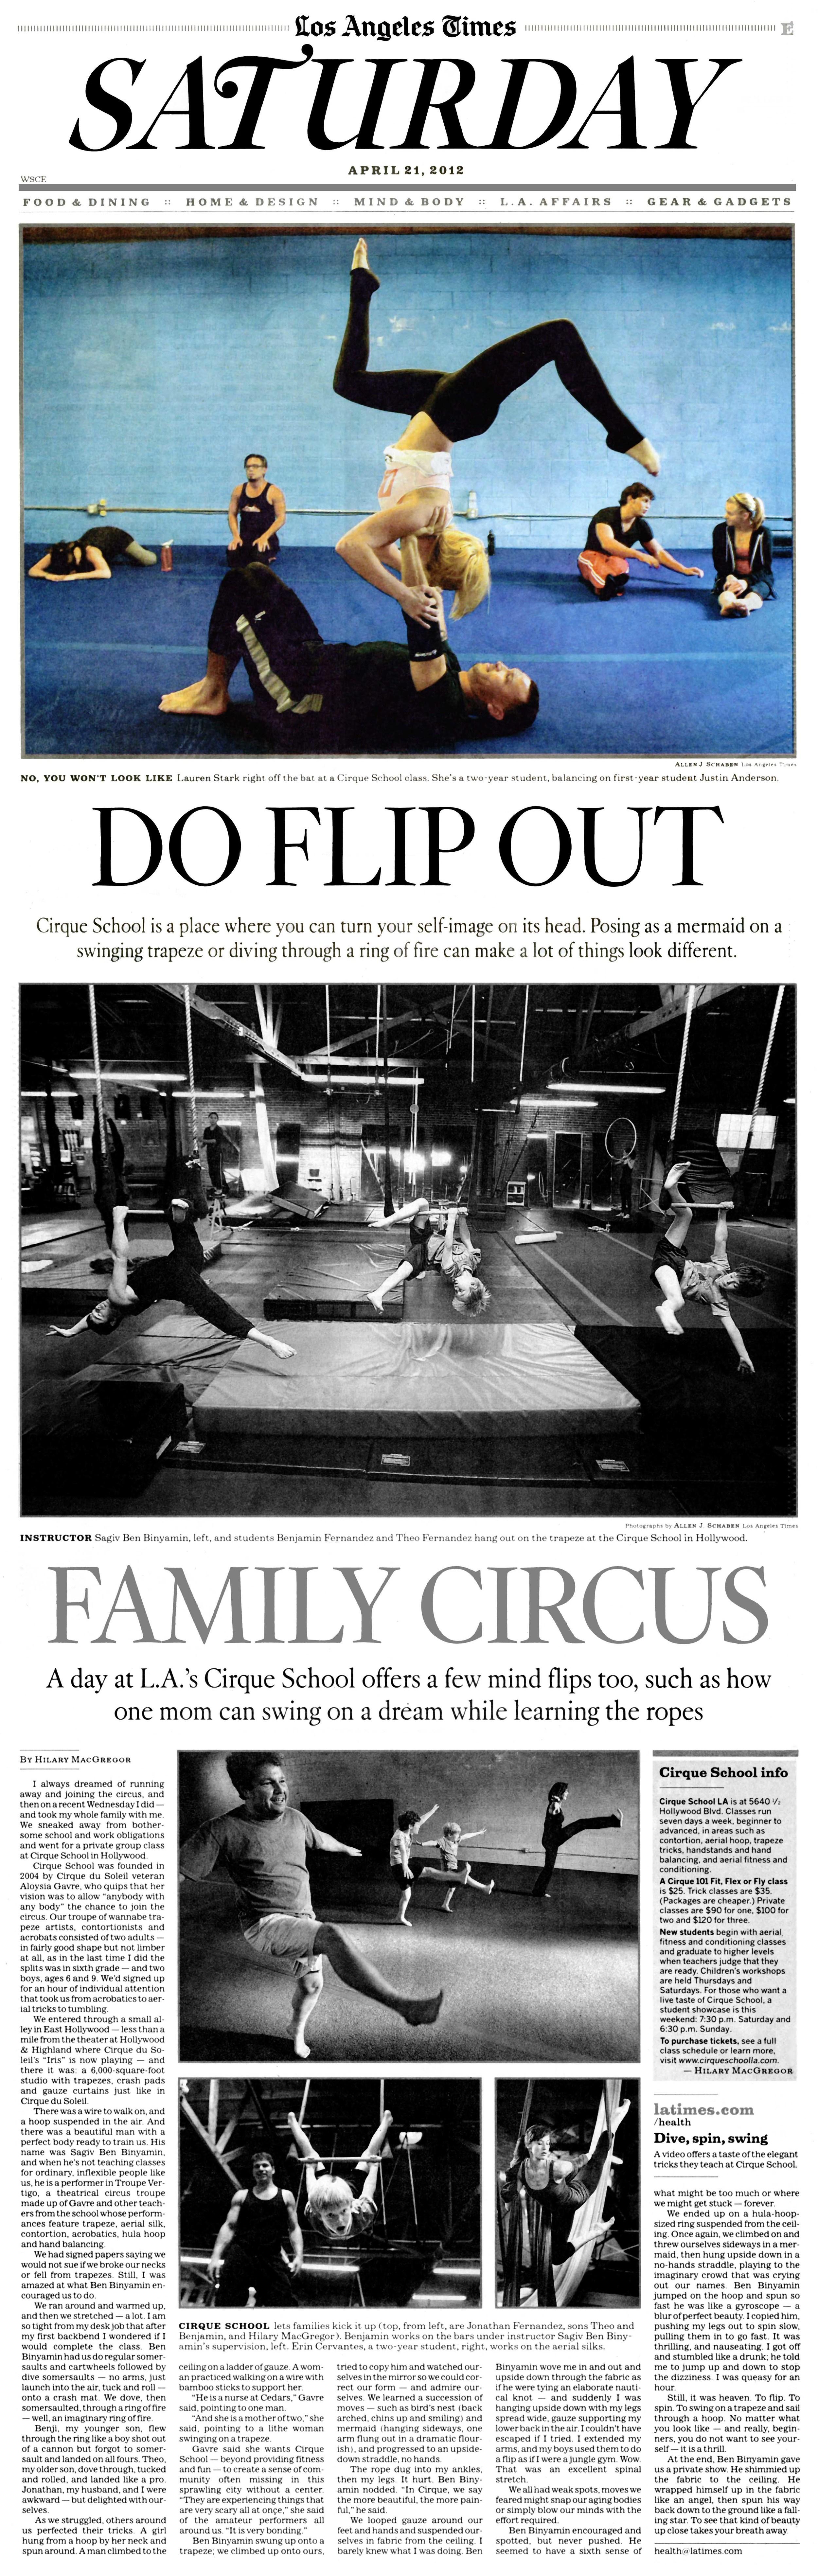 Cirque School_LATimes_4-12-12_article.jpg